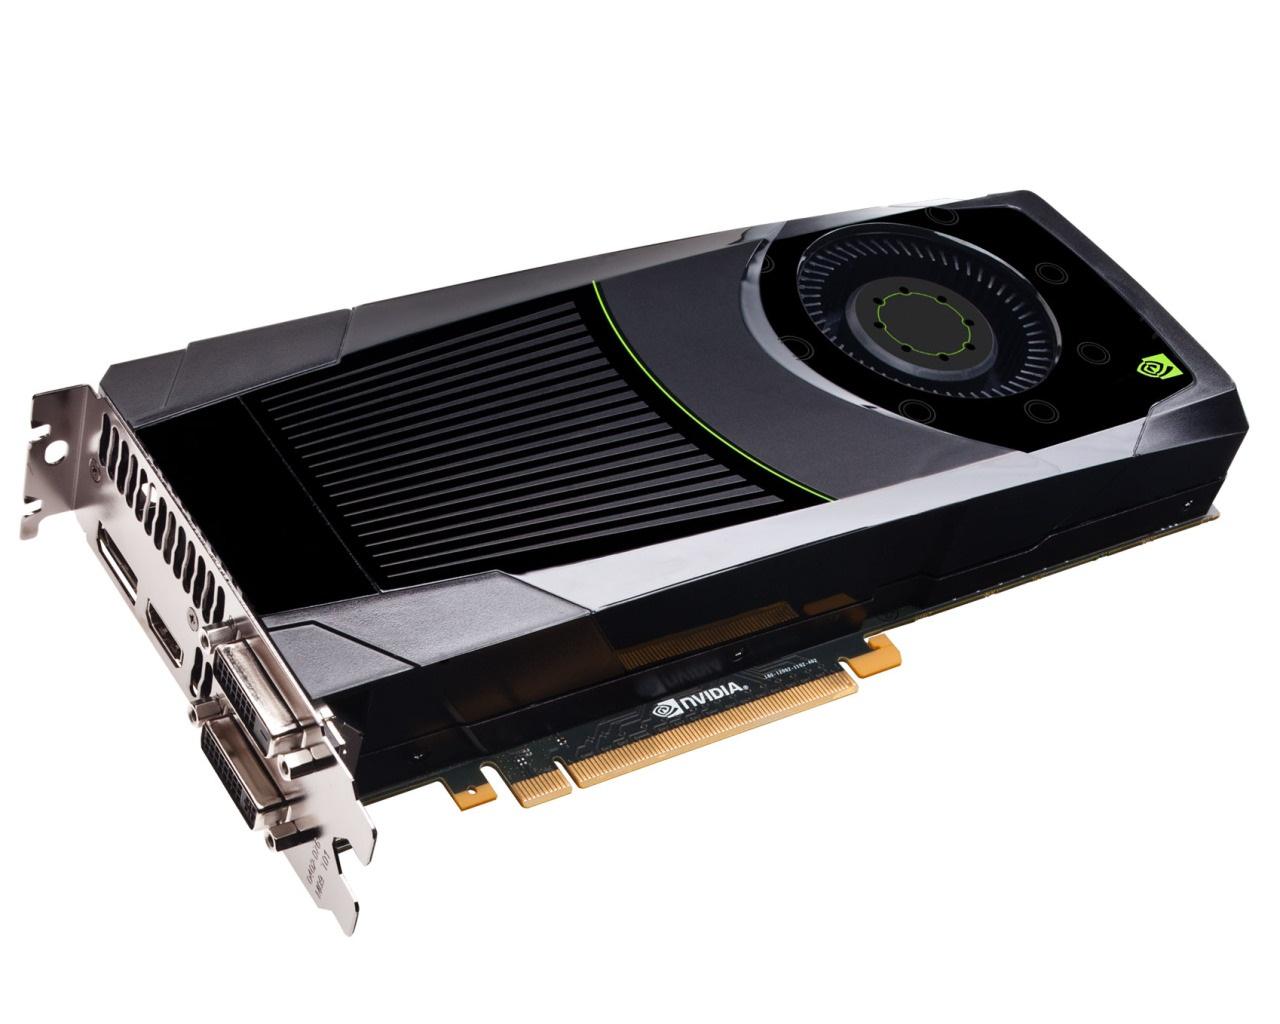 nvidia geforce gtx 680 - NVIDIA: taglio prezzi per le schede video GeForce GTX 680